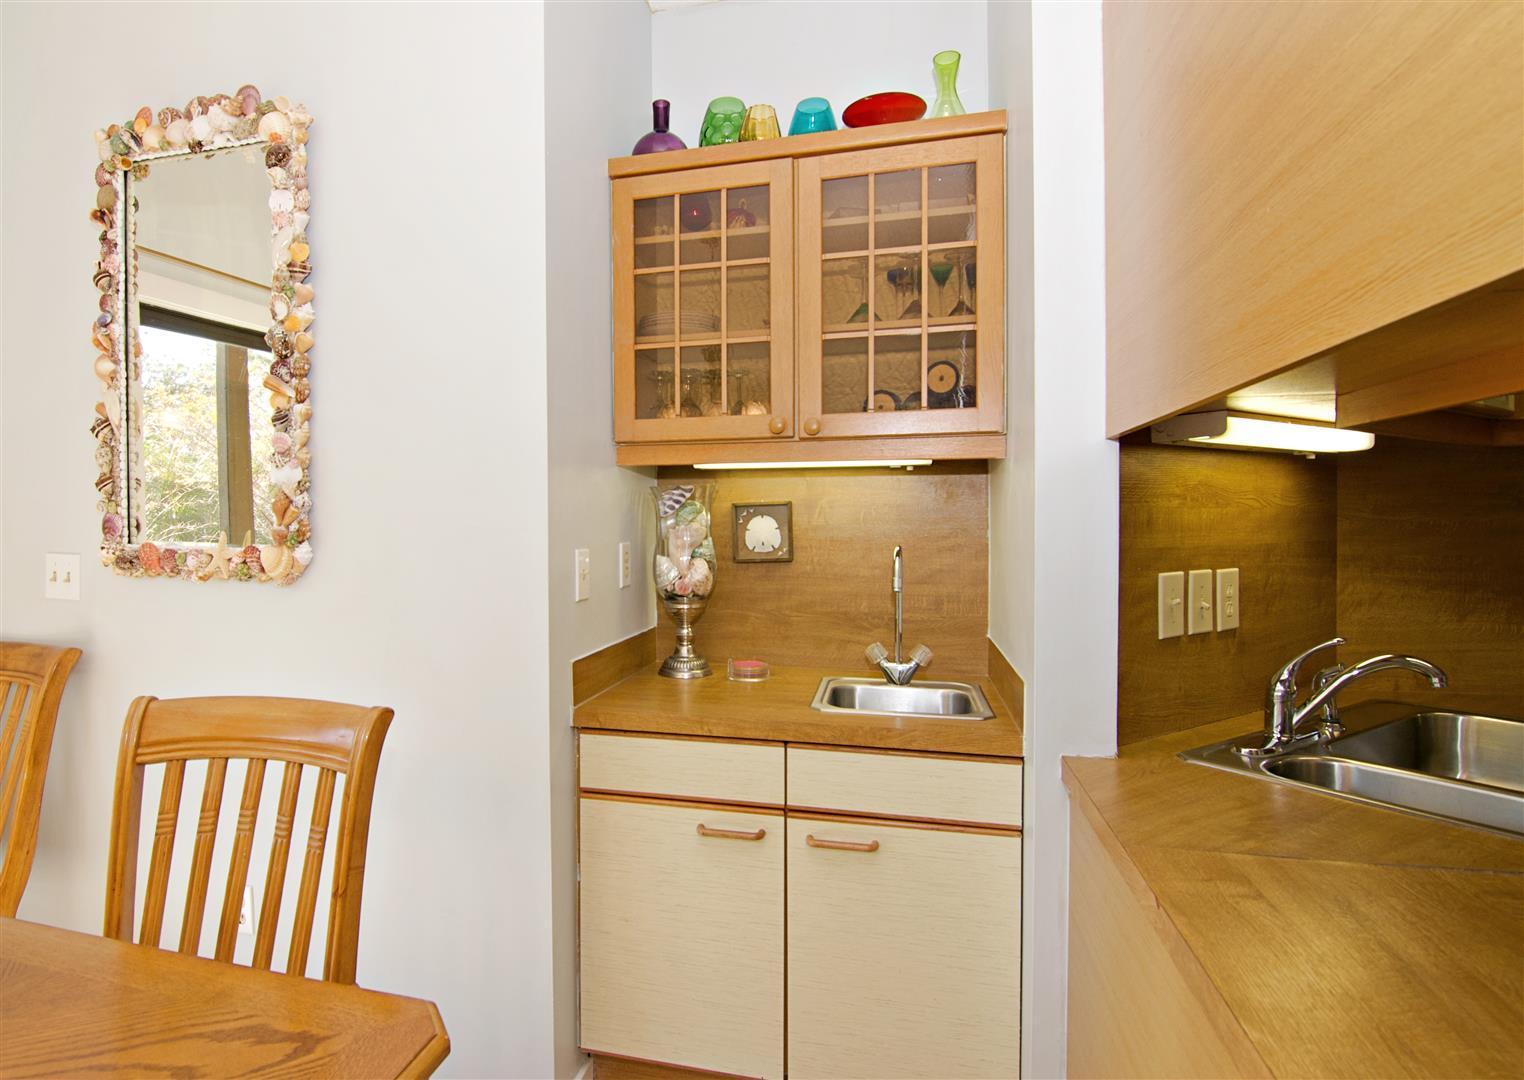 Seabrook Island Homes For Sale - 3020 Ocean Winds, Seabrook Island, SC - 32